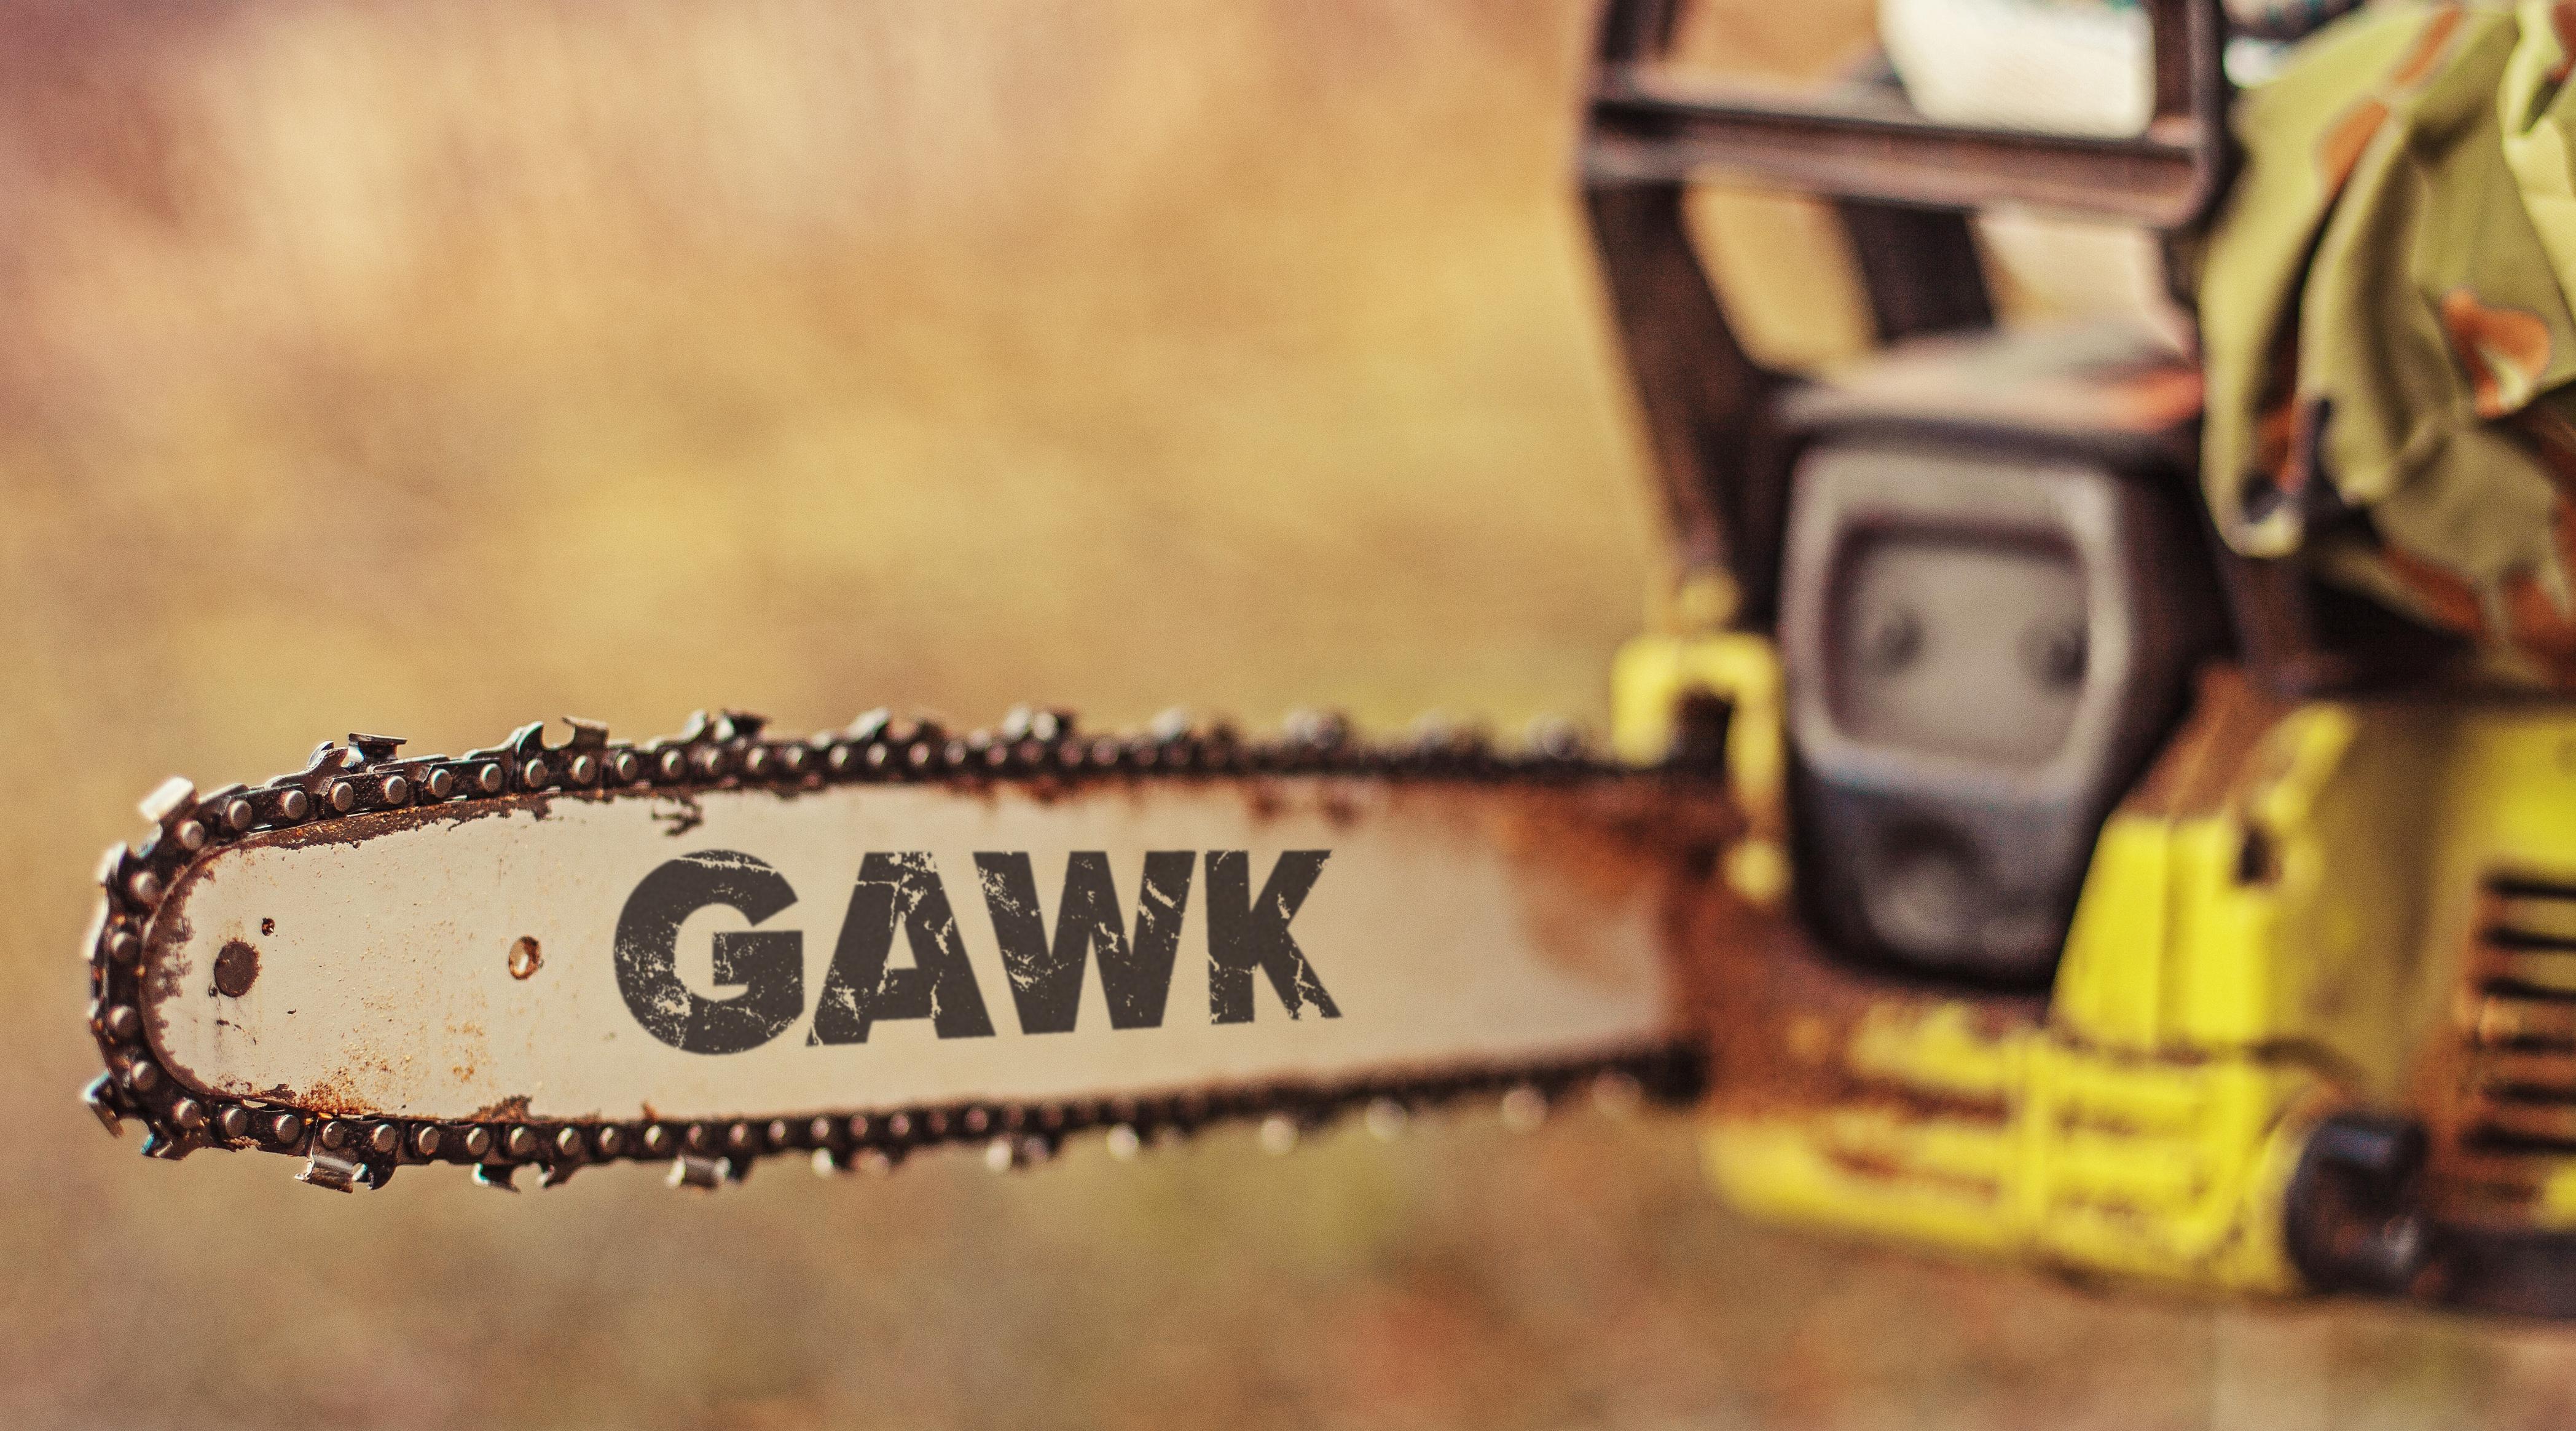 Gawking Hex Files | Hackaday